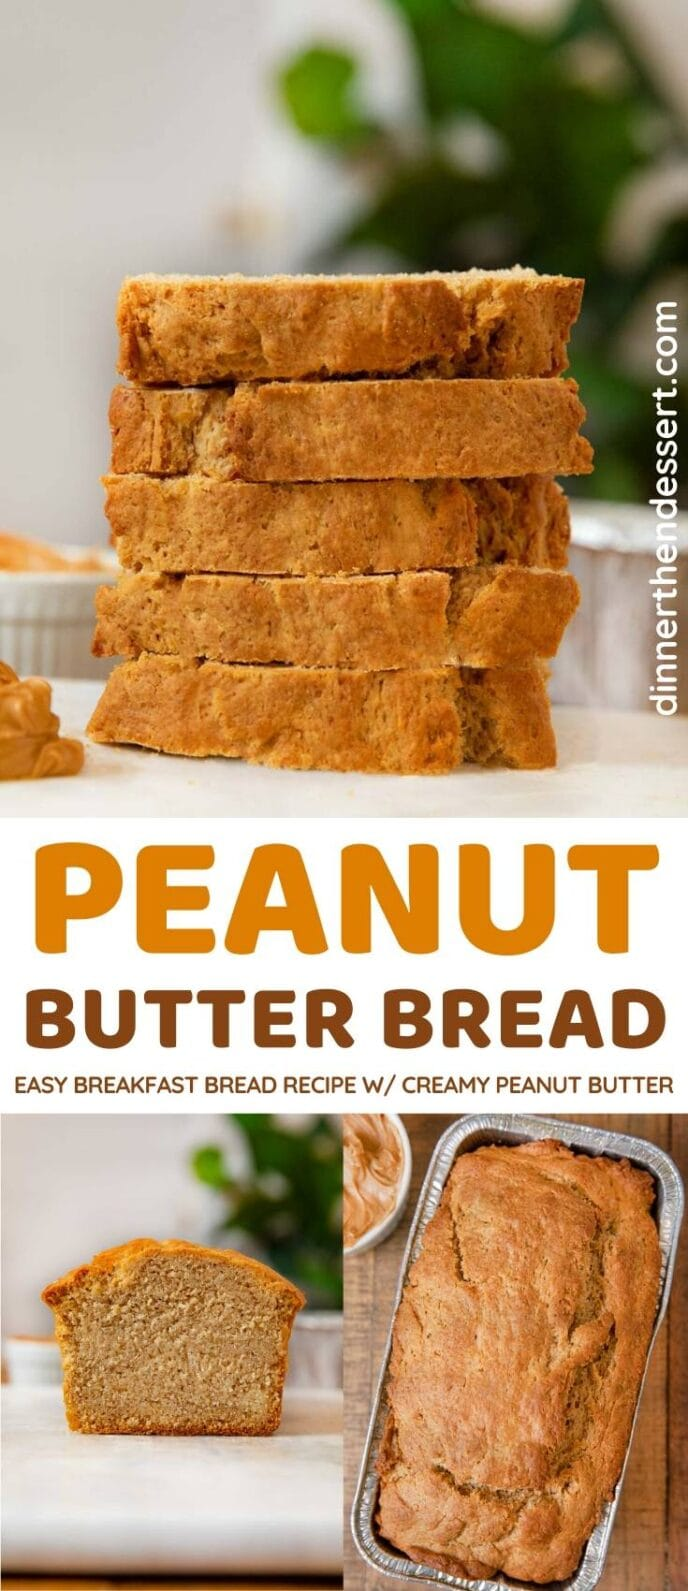 Peanut Butter Bread collage